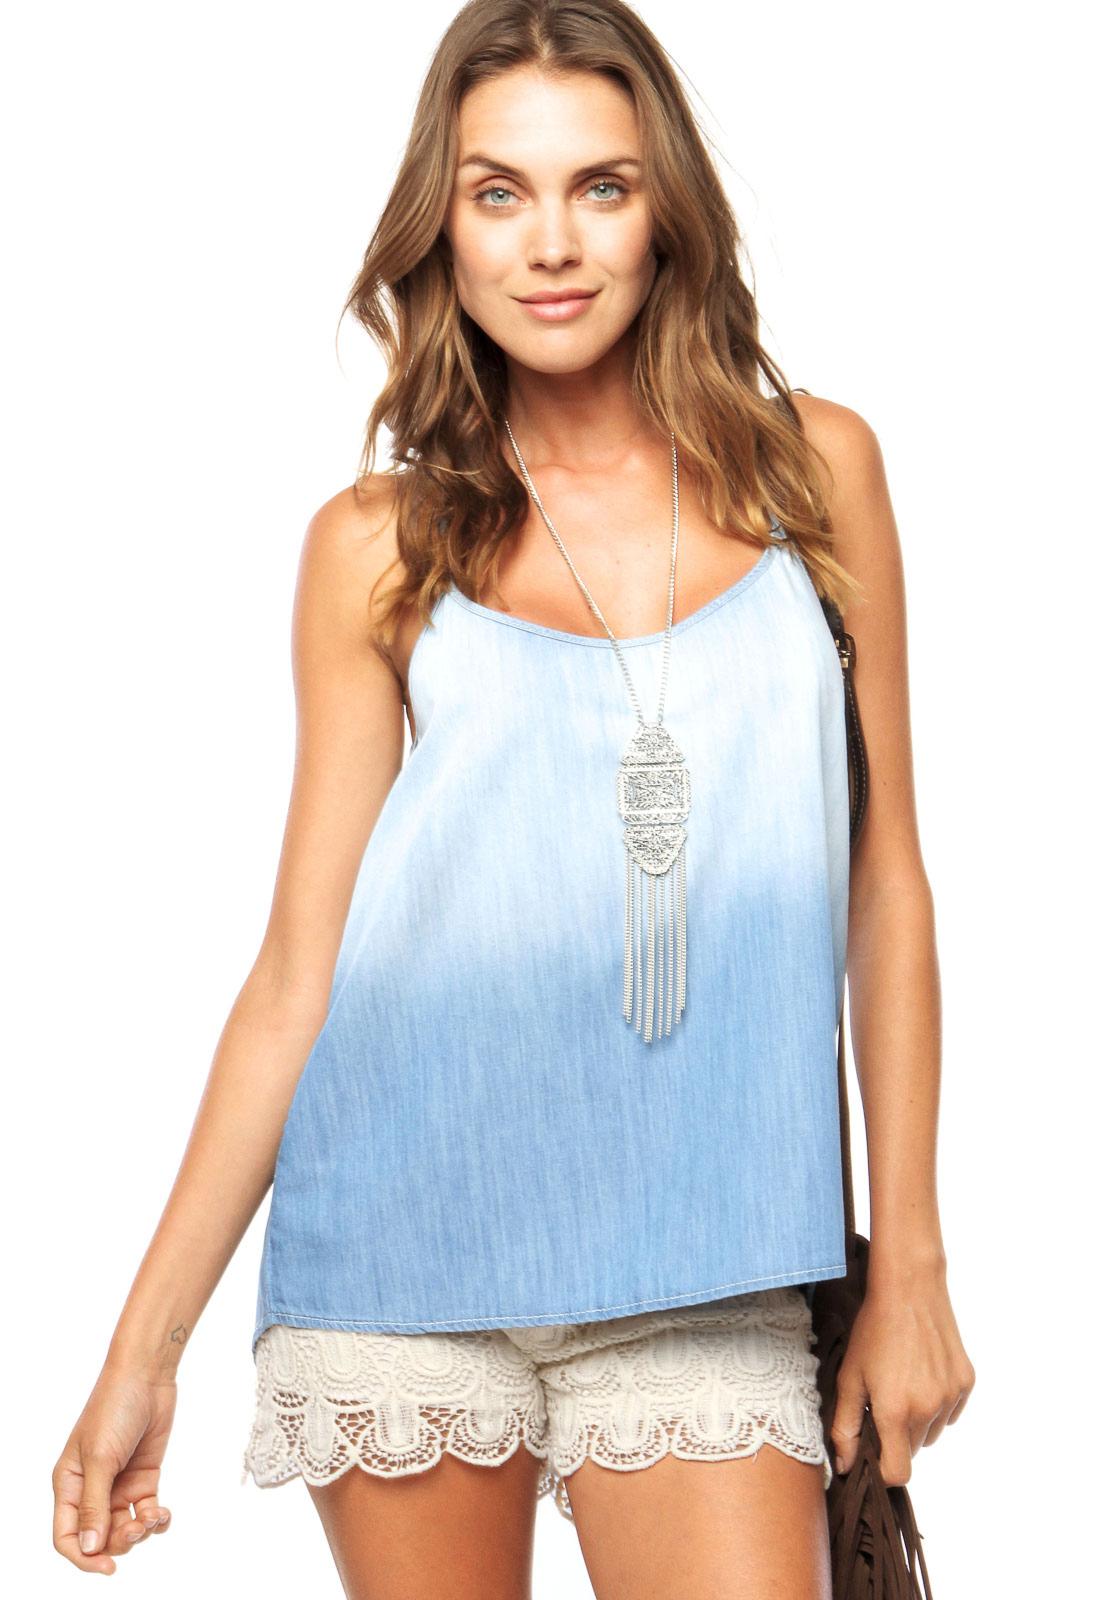 Bloom-Regata-Jeans-Bloom-London-Azul-5037-6718771-1-zoom